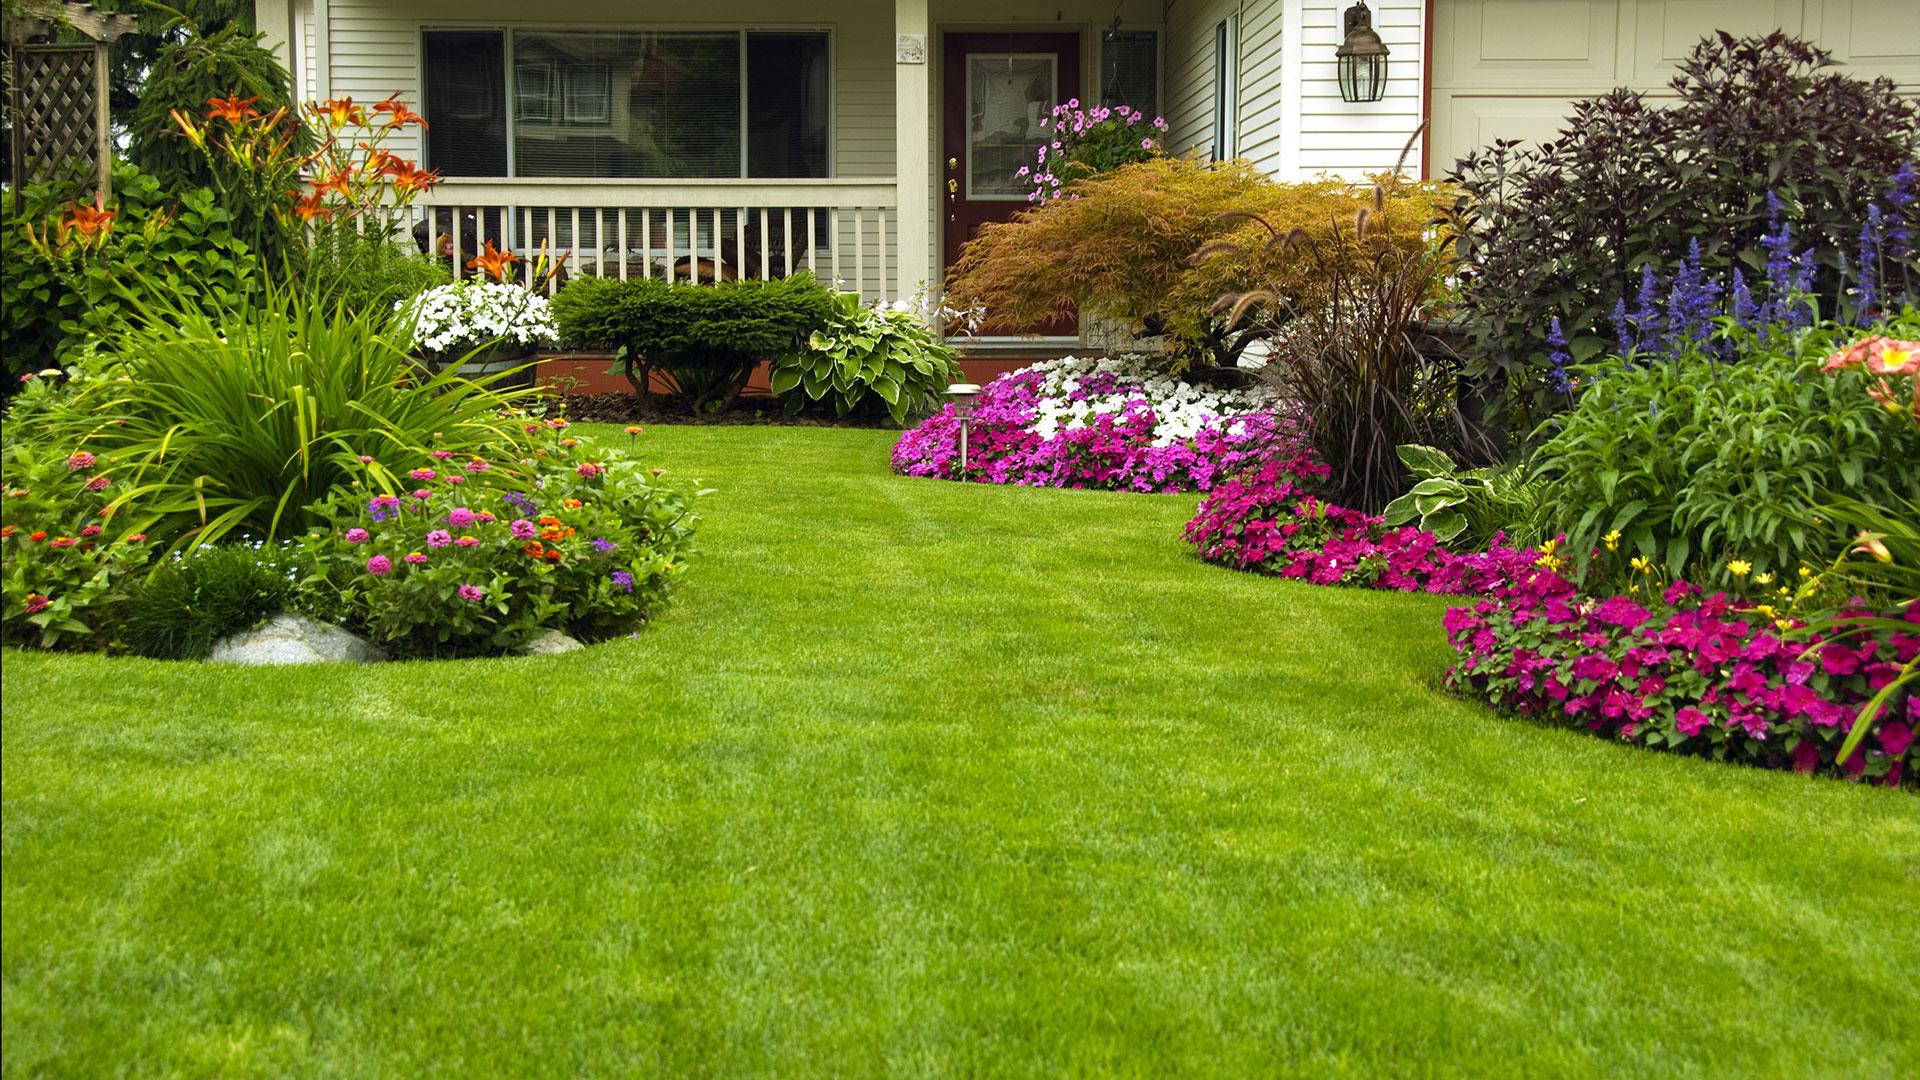 Beautify Your Garden with Garden Edging Ideas